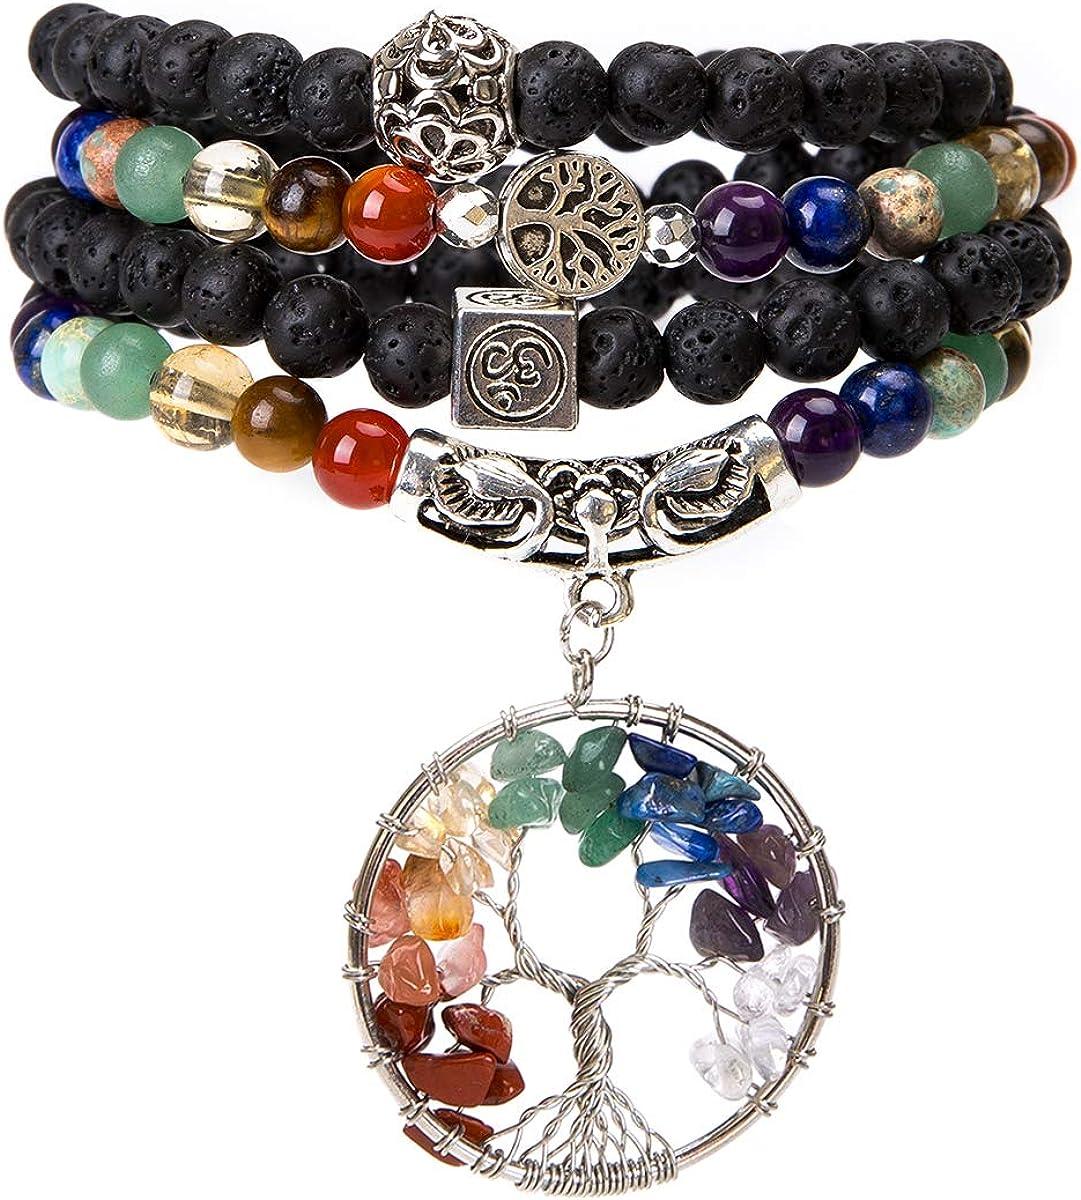 Bivei 108 Mala Beads Bracelet - 7 Chakra Tree of Life Real Healing Gemstone Yoga Meditation Mala Prayer Bead Necklace